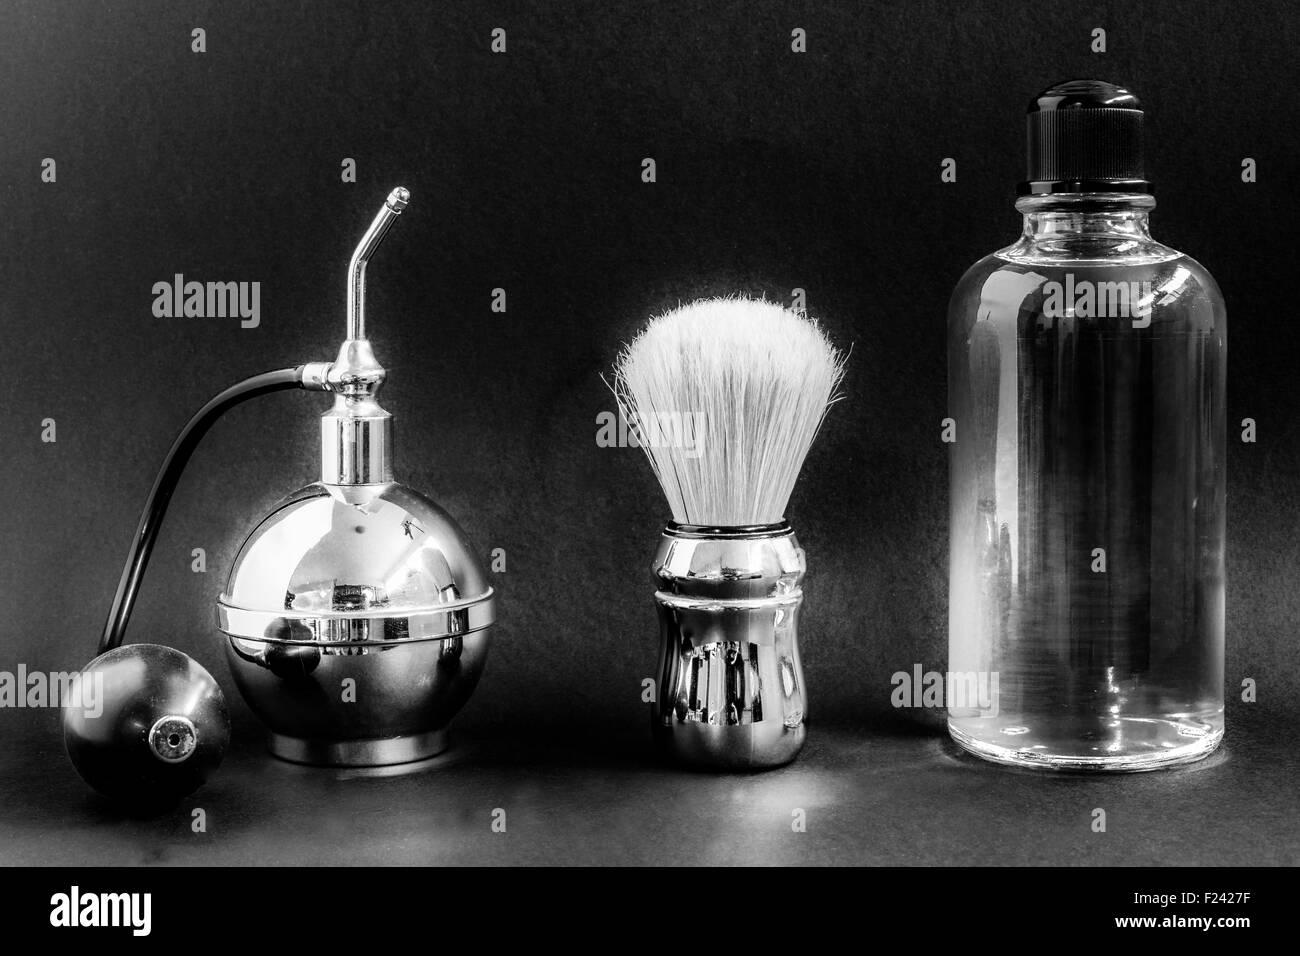 vaporizer sahving brush perfume - Stock Image